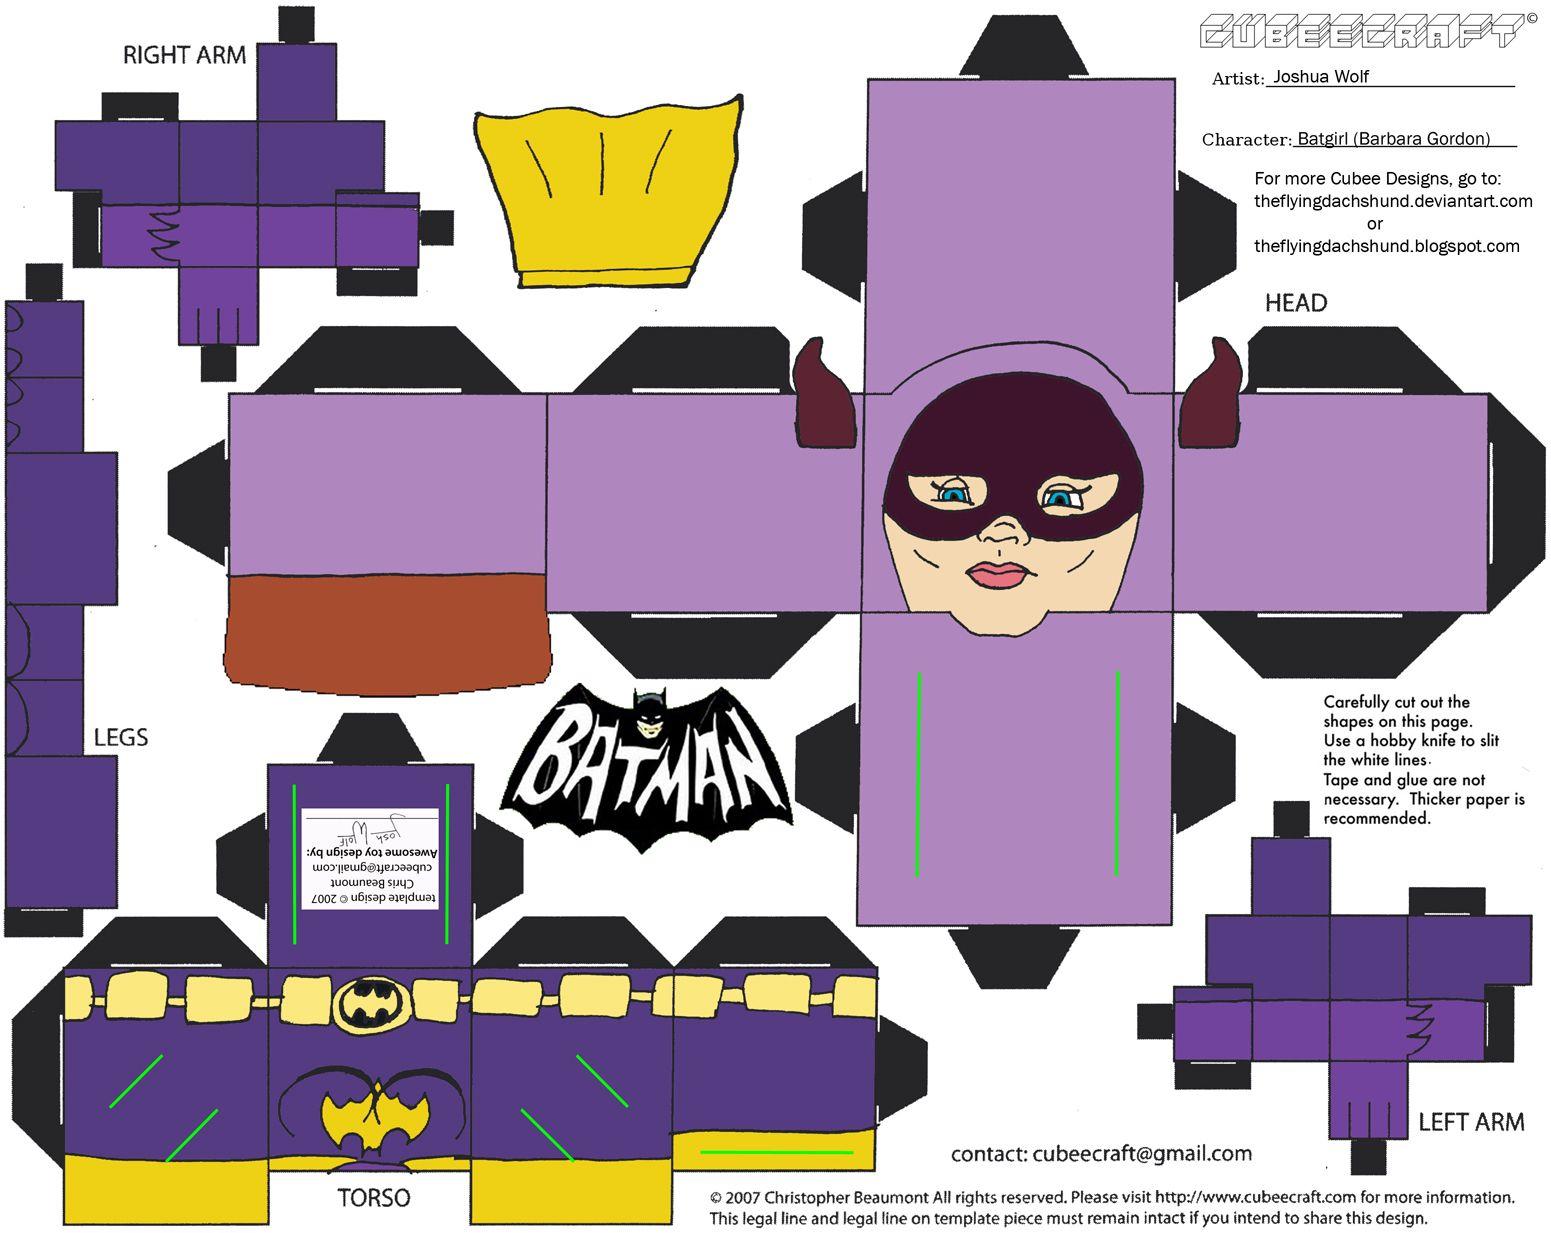 60sbat1 Batgirl Cubee By Theflyingdachshundviantart On Deviantart